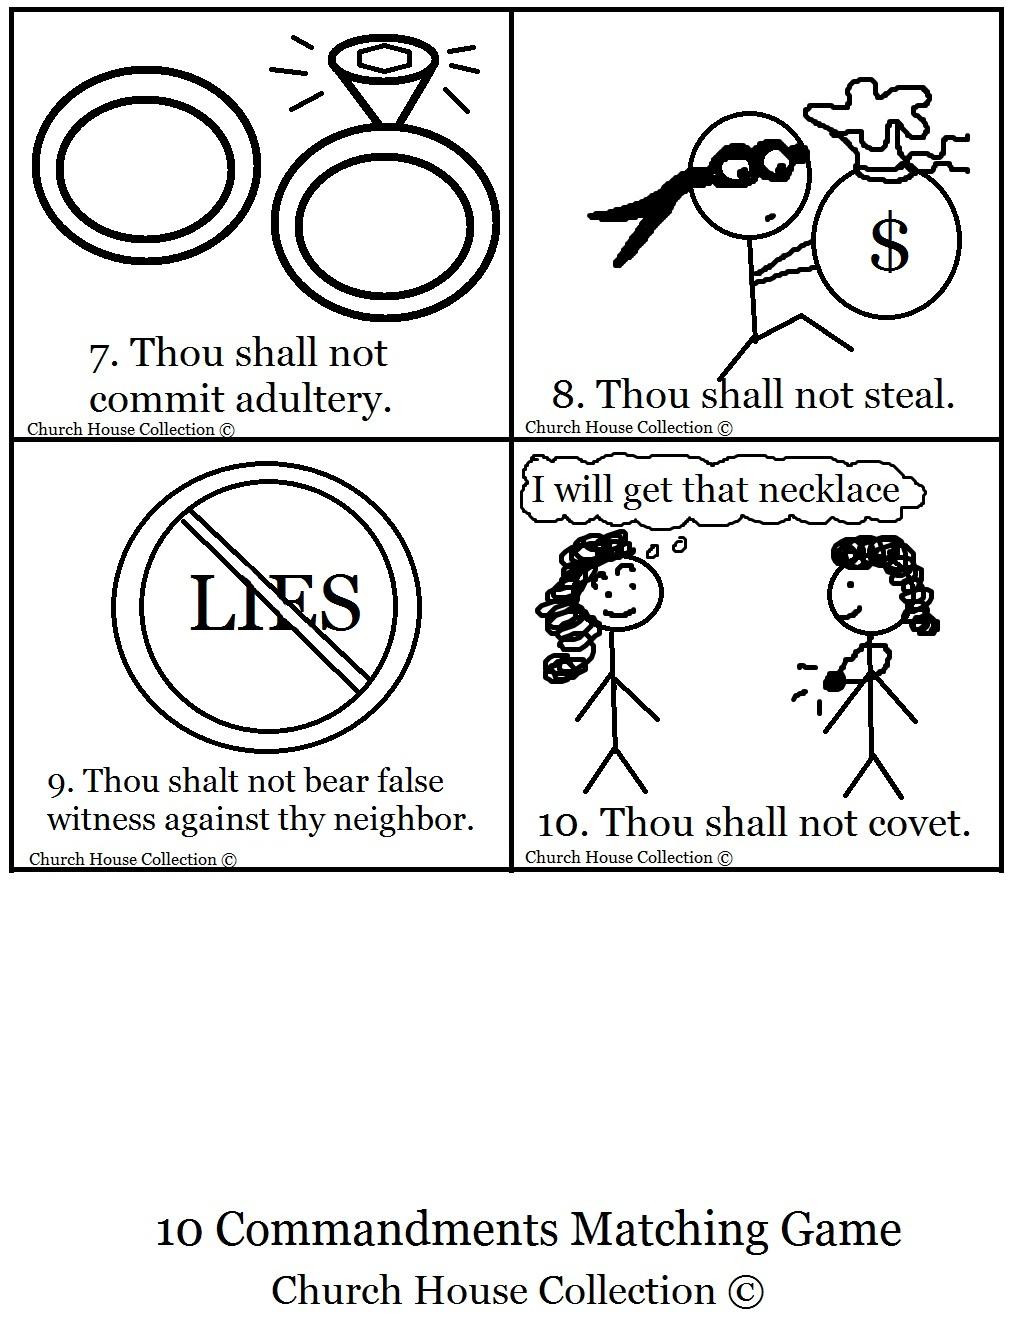 10 Commandments Bible Matching